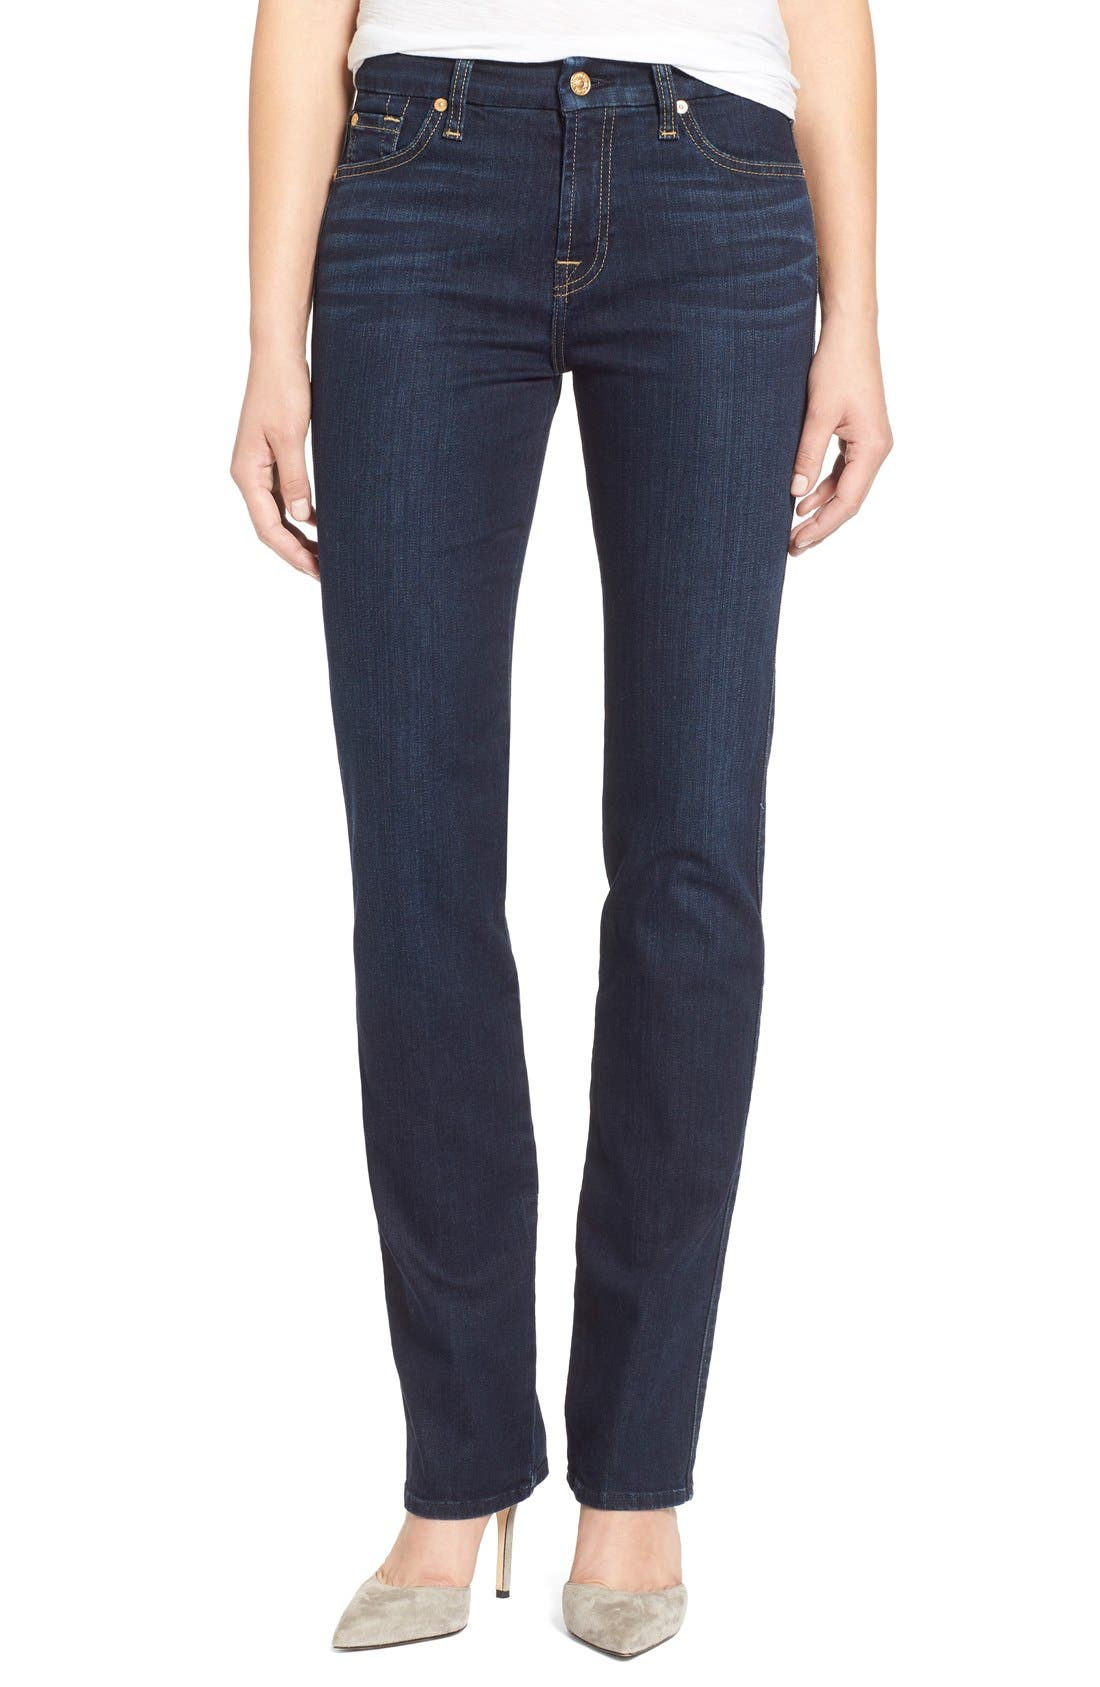 Alternate Image 1 Selected - 7 For All Mankind® 'Kimmie' Straight Leg Jeans (Dark Dusk Indigo)